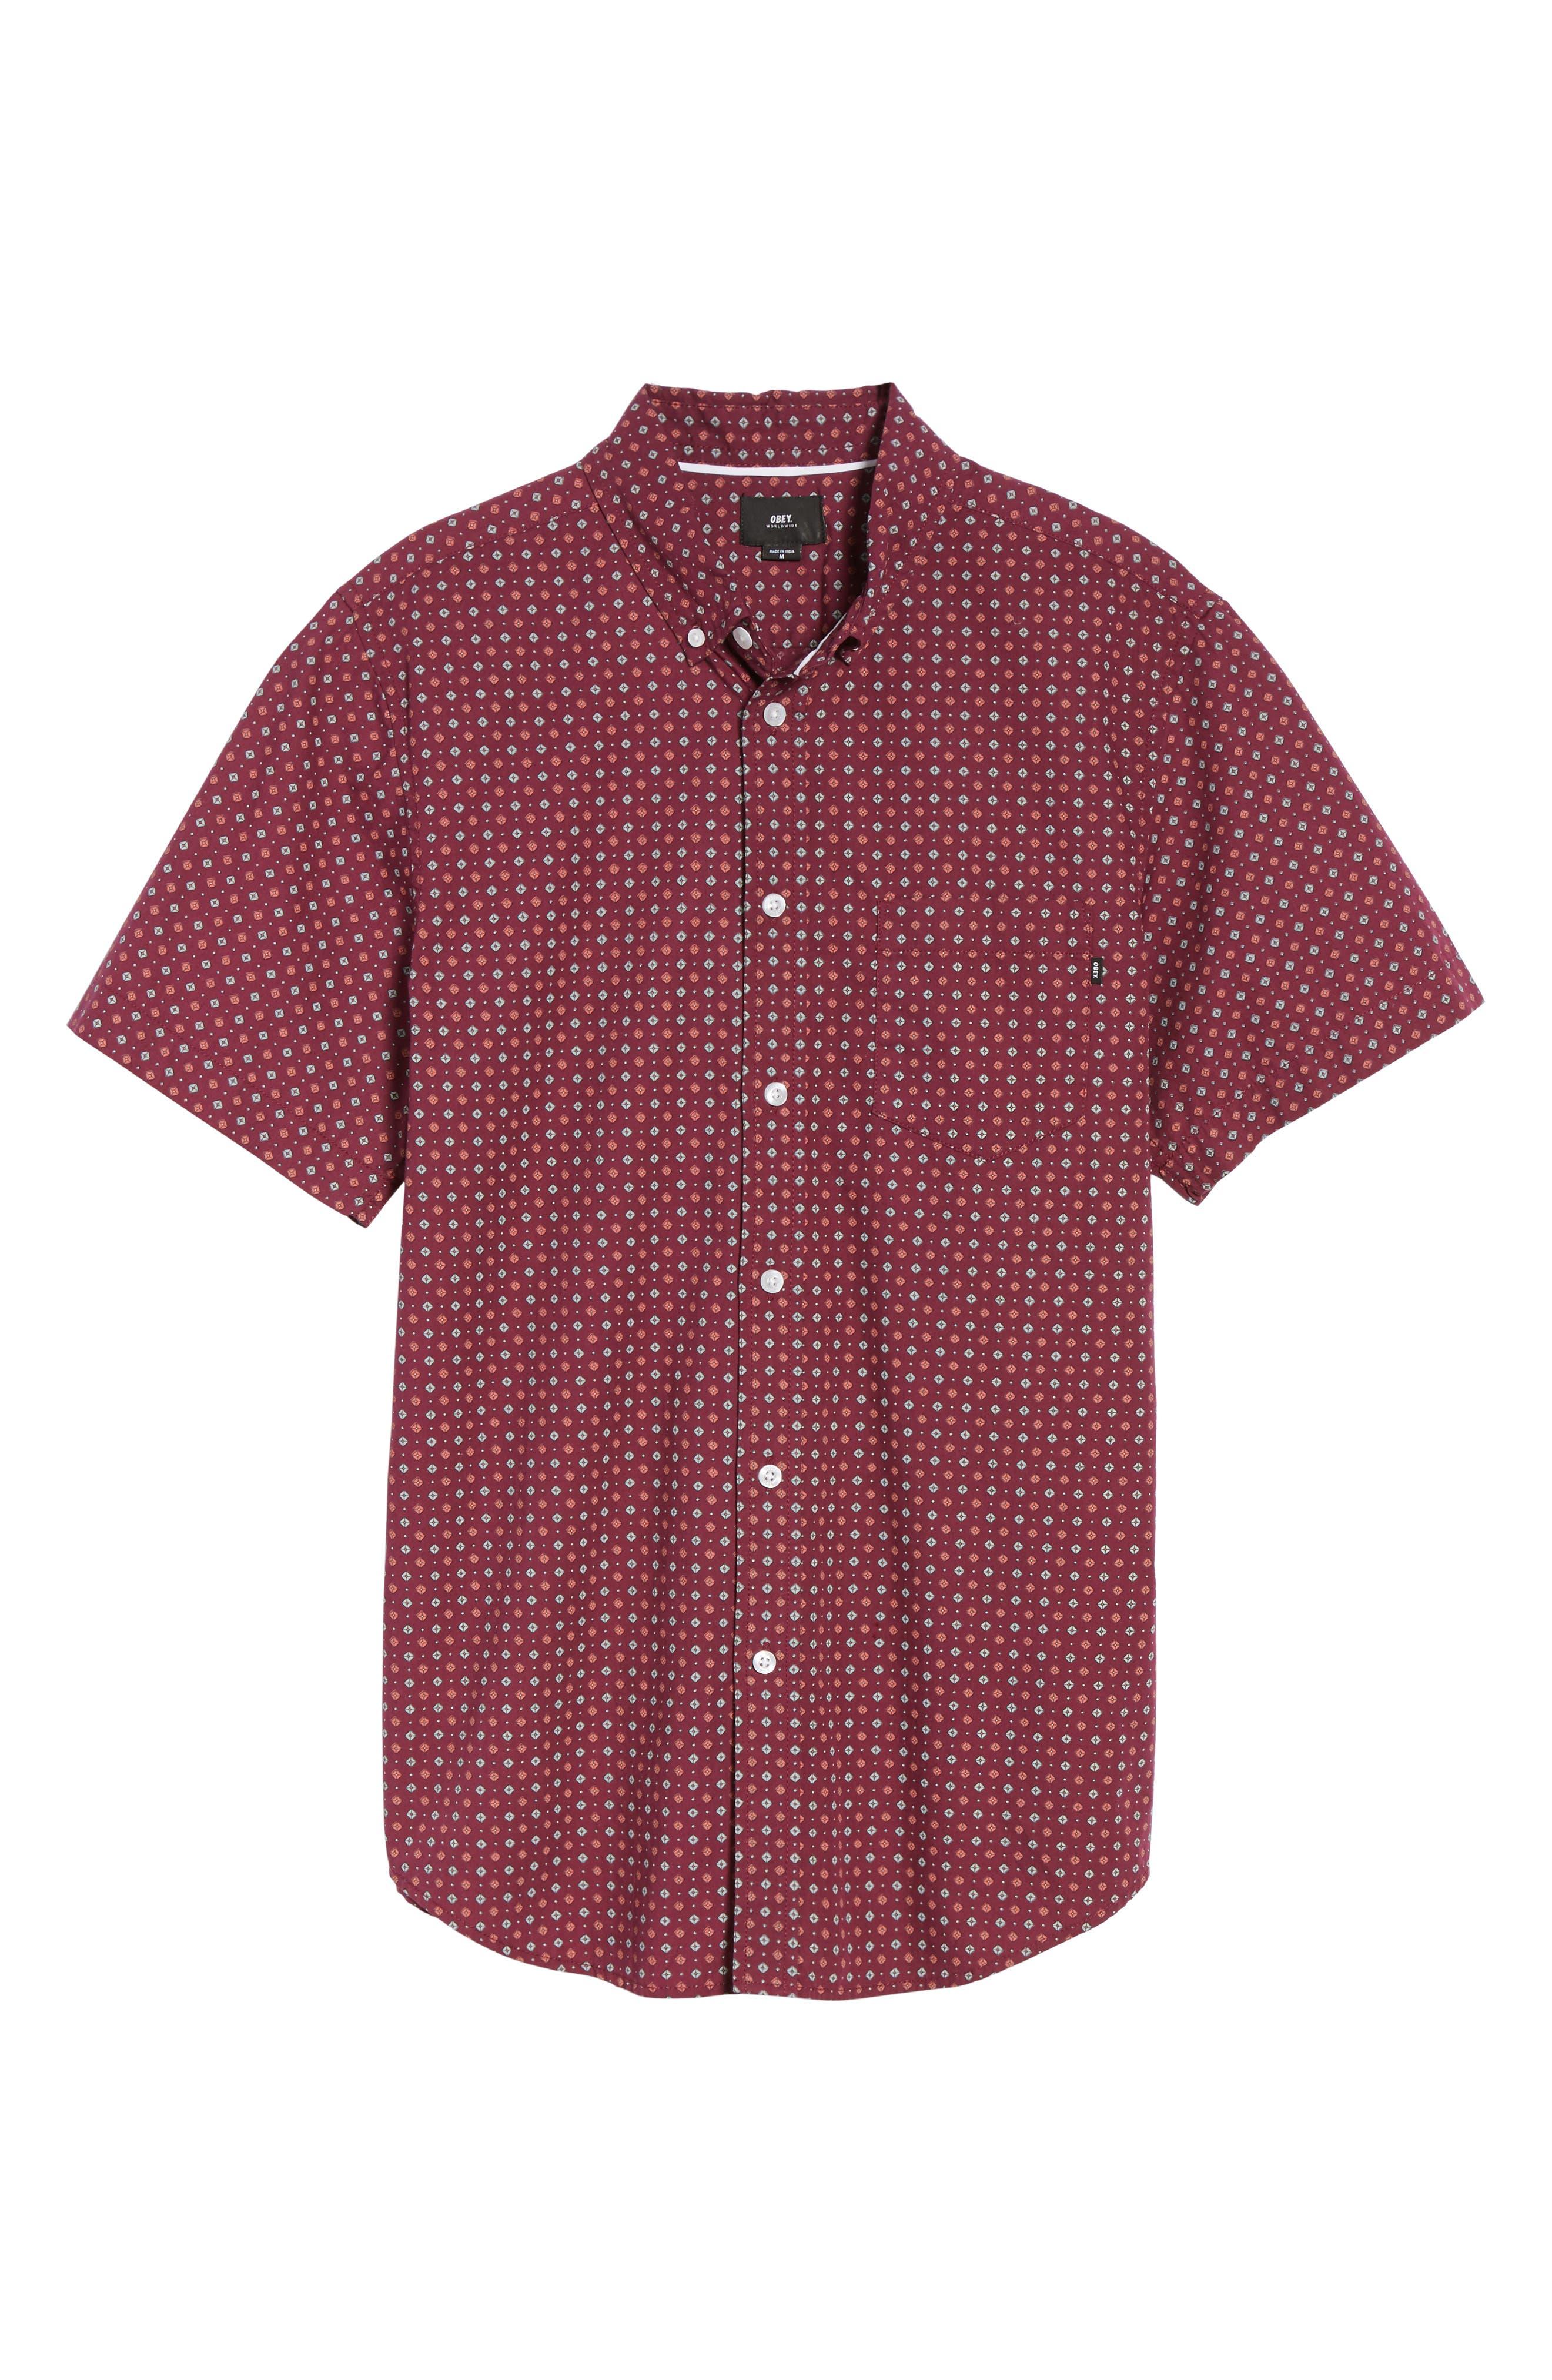 Sterling Woven Shirt,                             Alternate thumbnail 12, color,